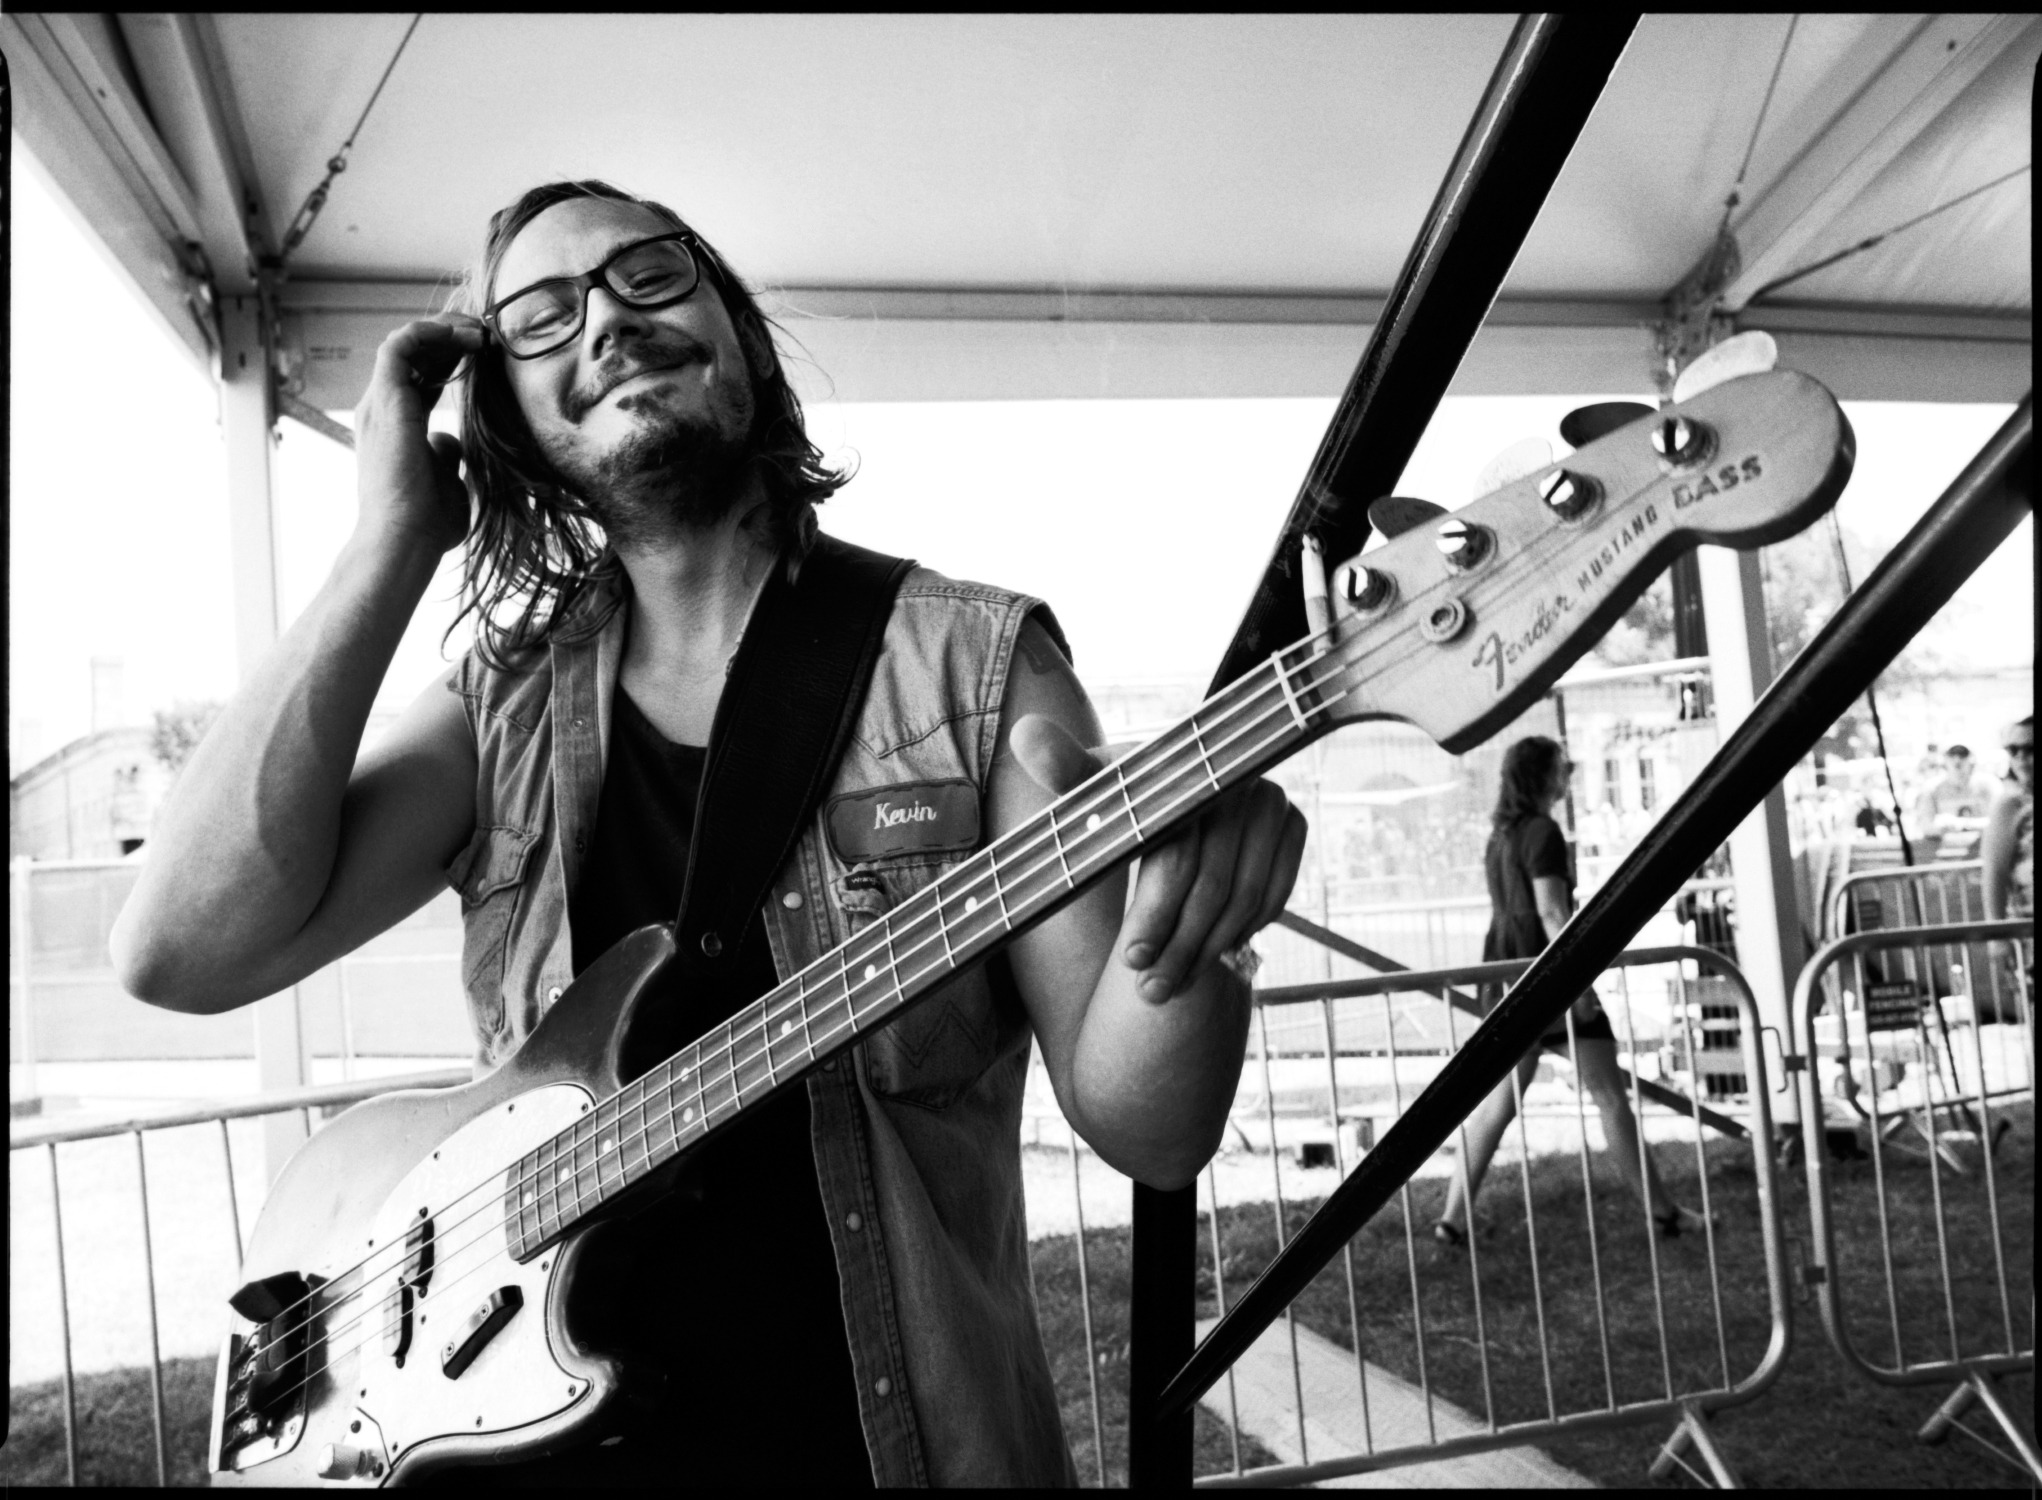 Kevin Black, bass player for margo price | newport folk fest